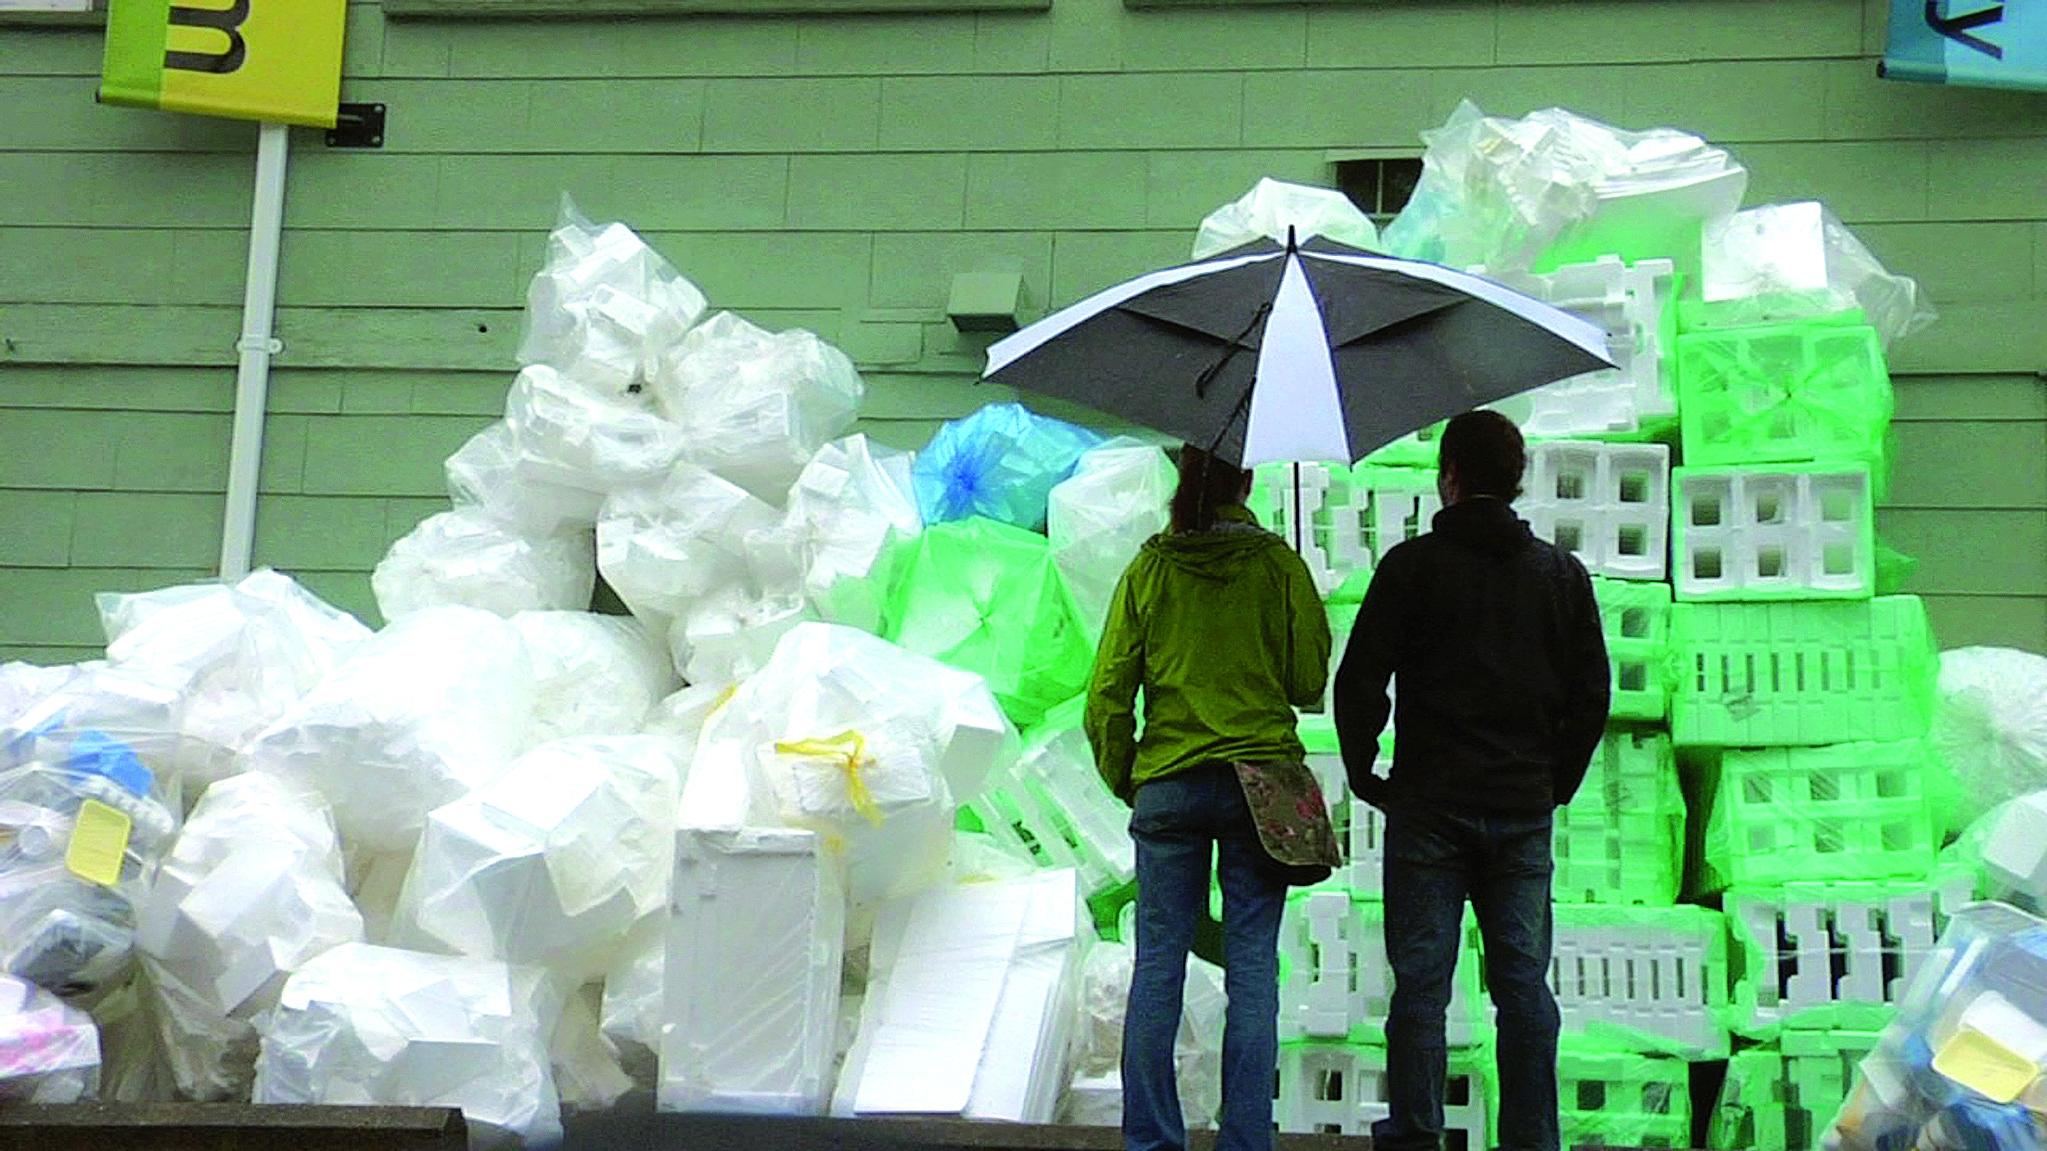 The clean bin project - Divulgação/ND